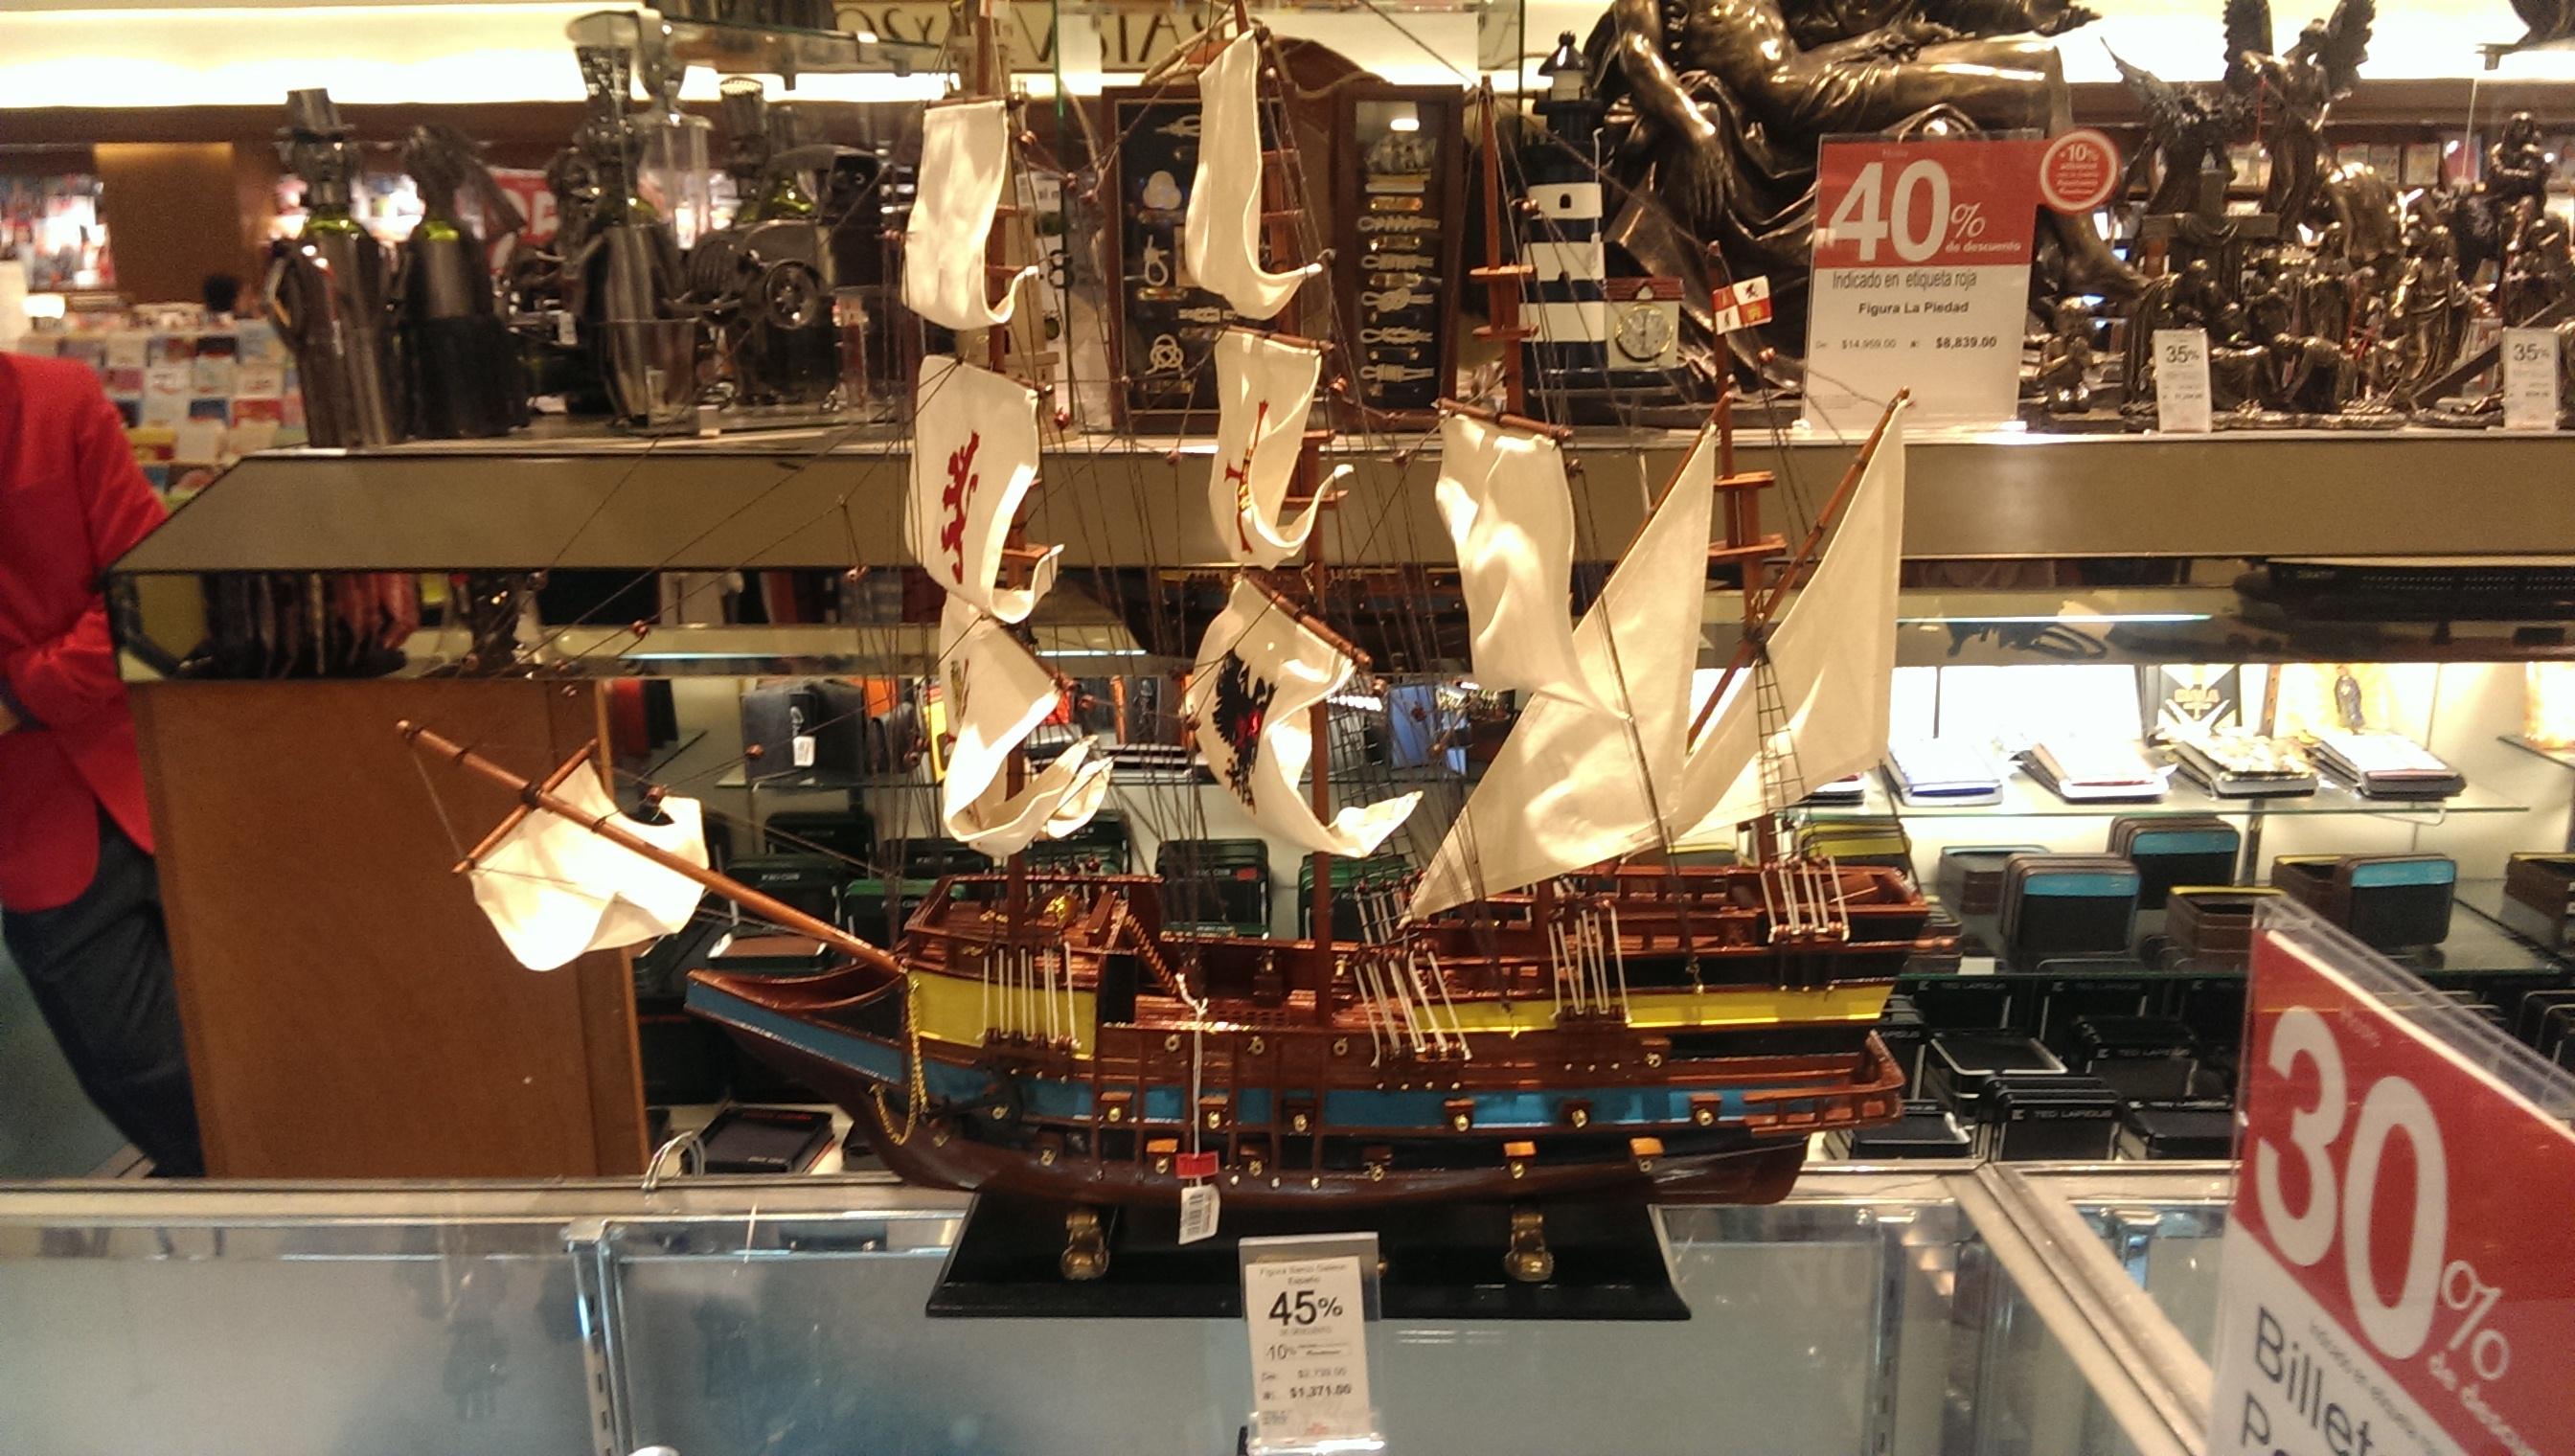 Sanborns: Barco galeón español $1,371 (original $2,740)